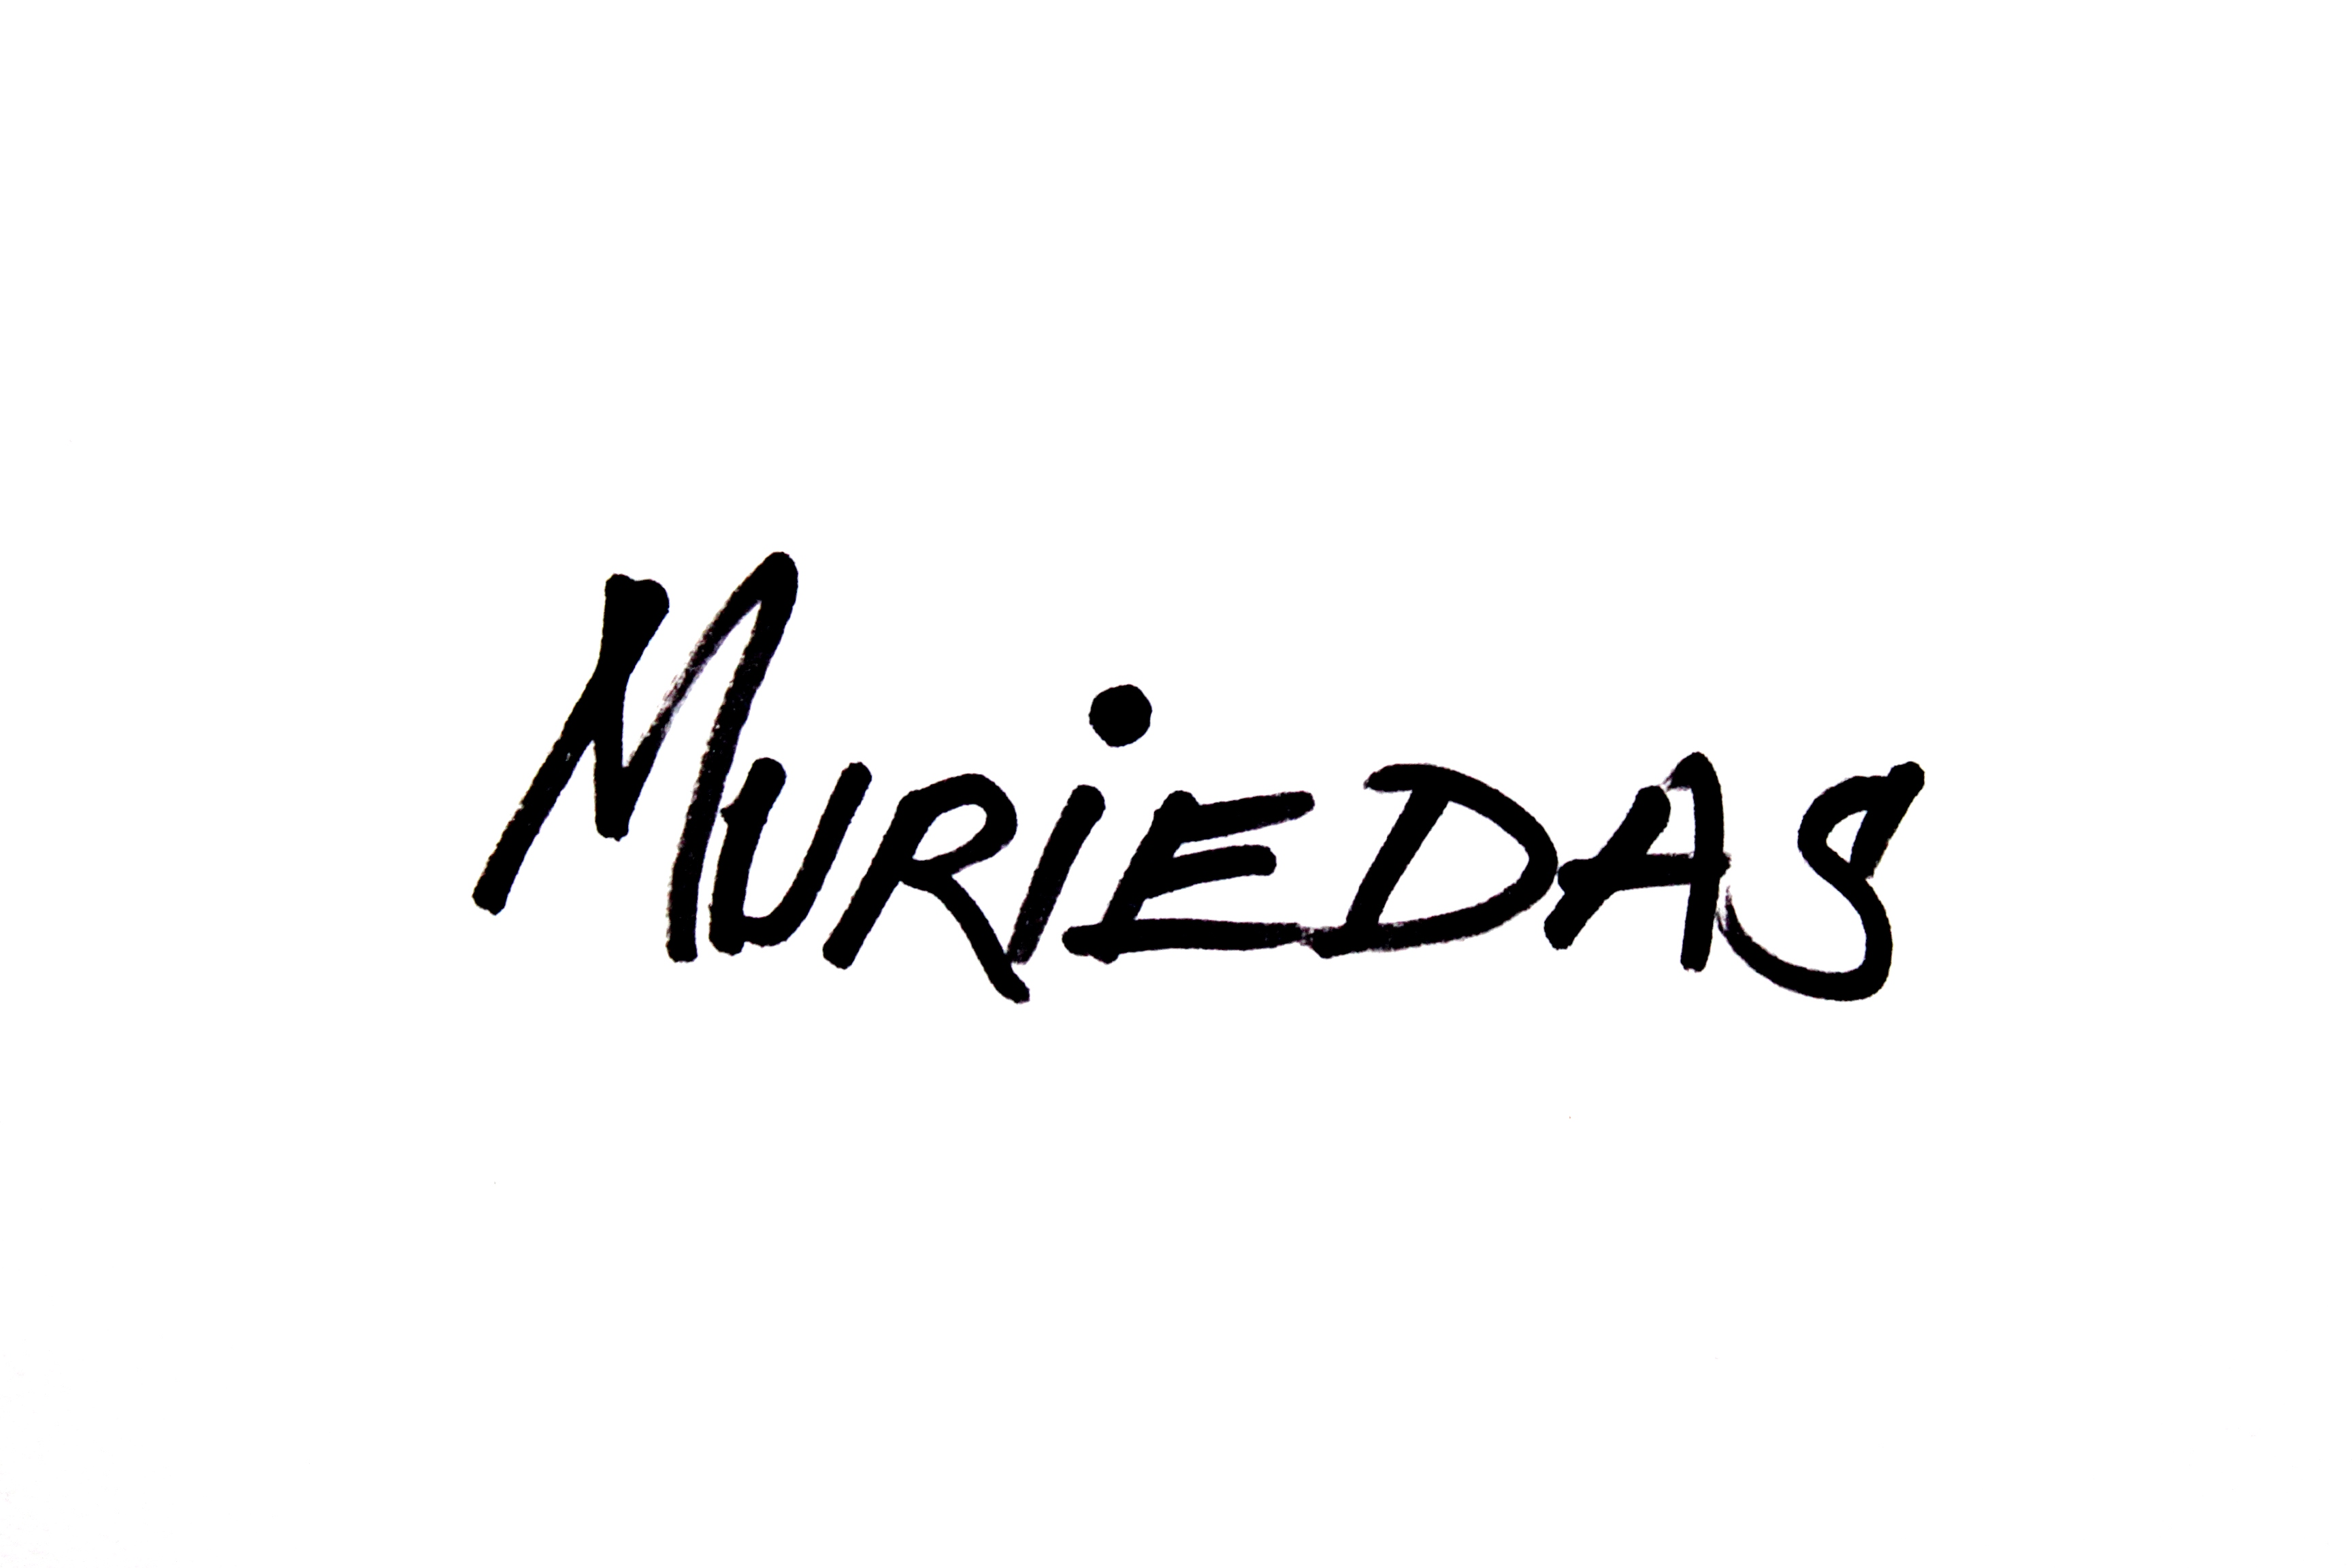 Lorenzo Muriedas's Signature